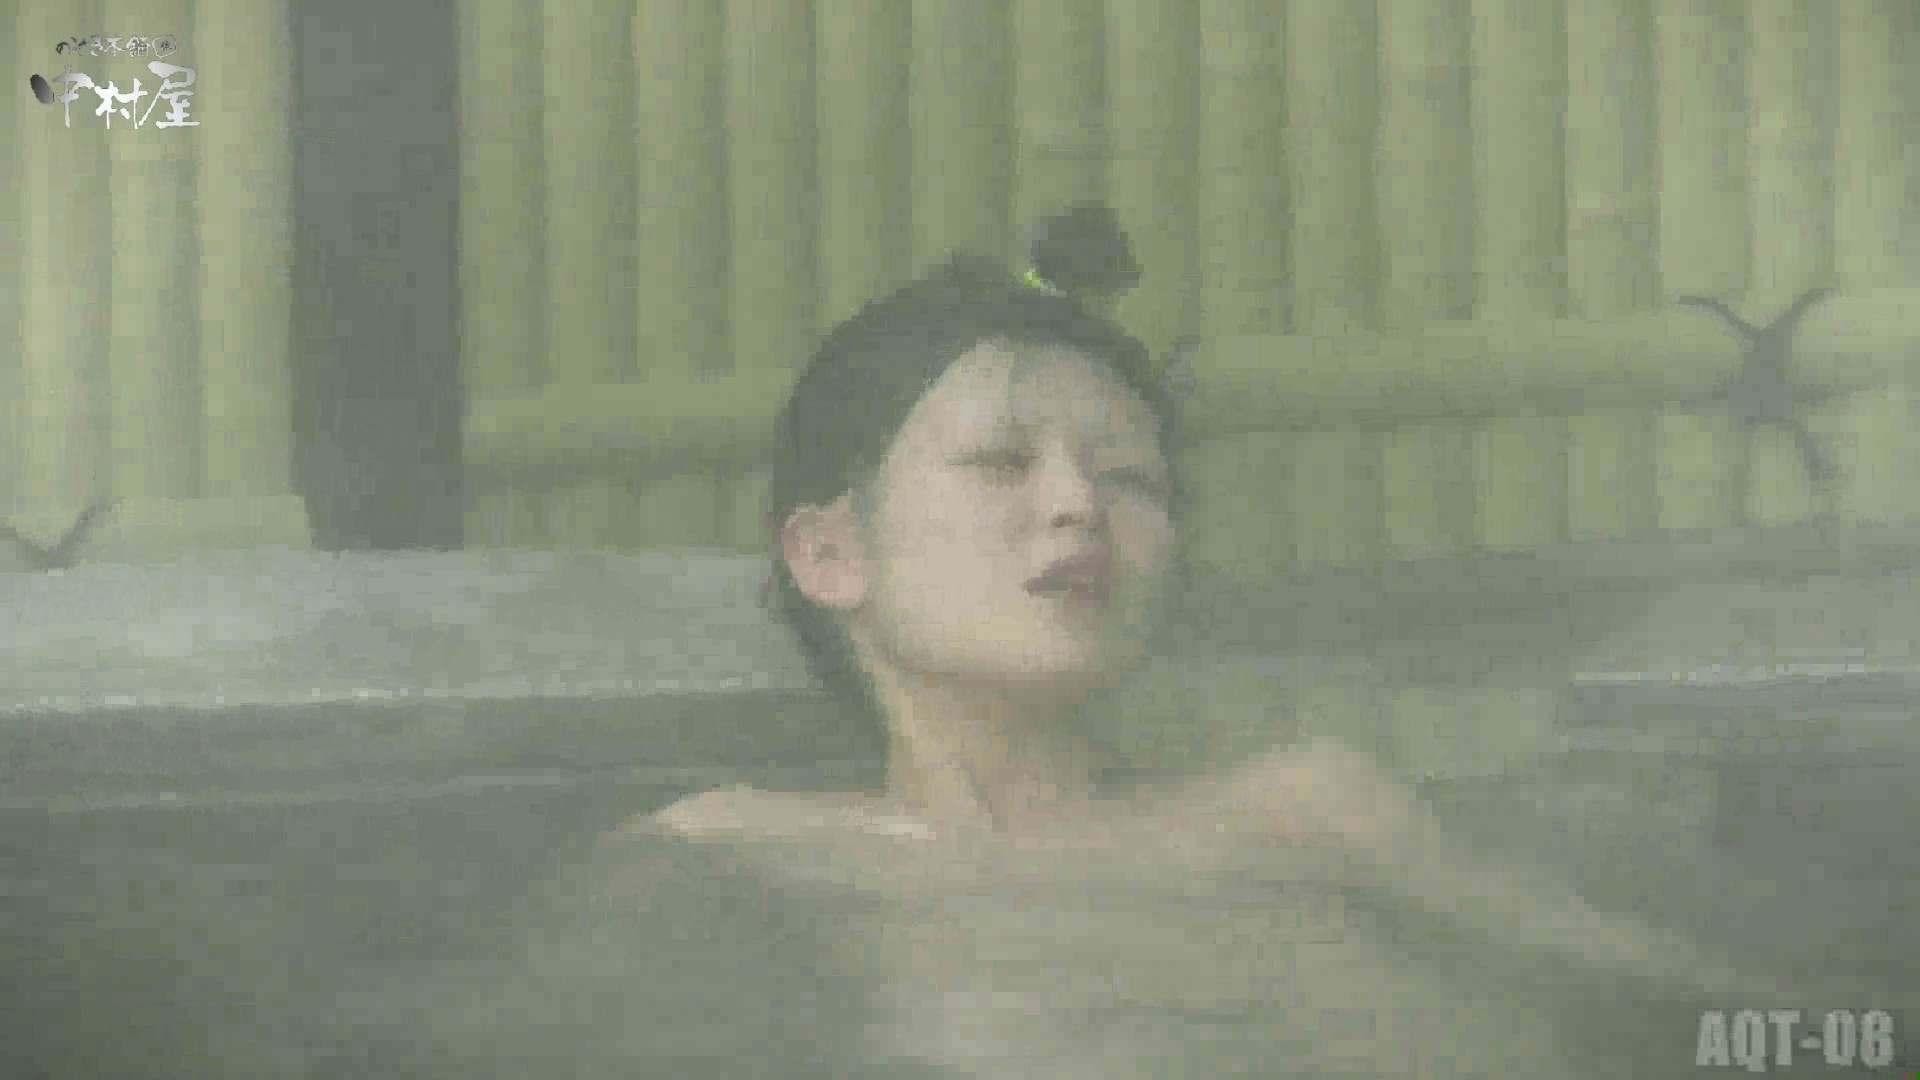 Aquaな露天風呂Vol.872潜入盗撮露天風呂八判湯 其の五 潜入   露天  110枚 33